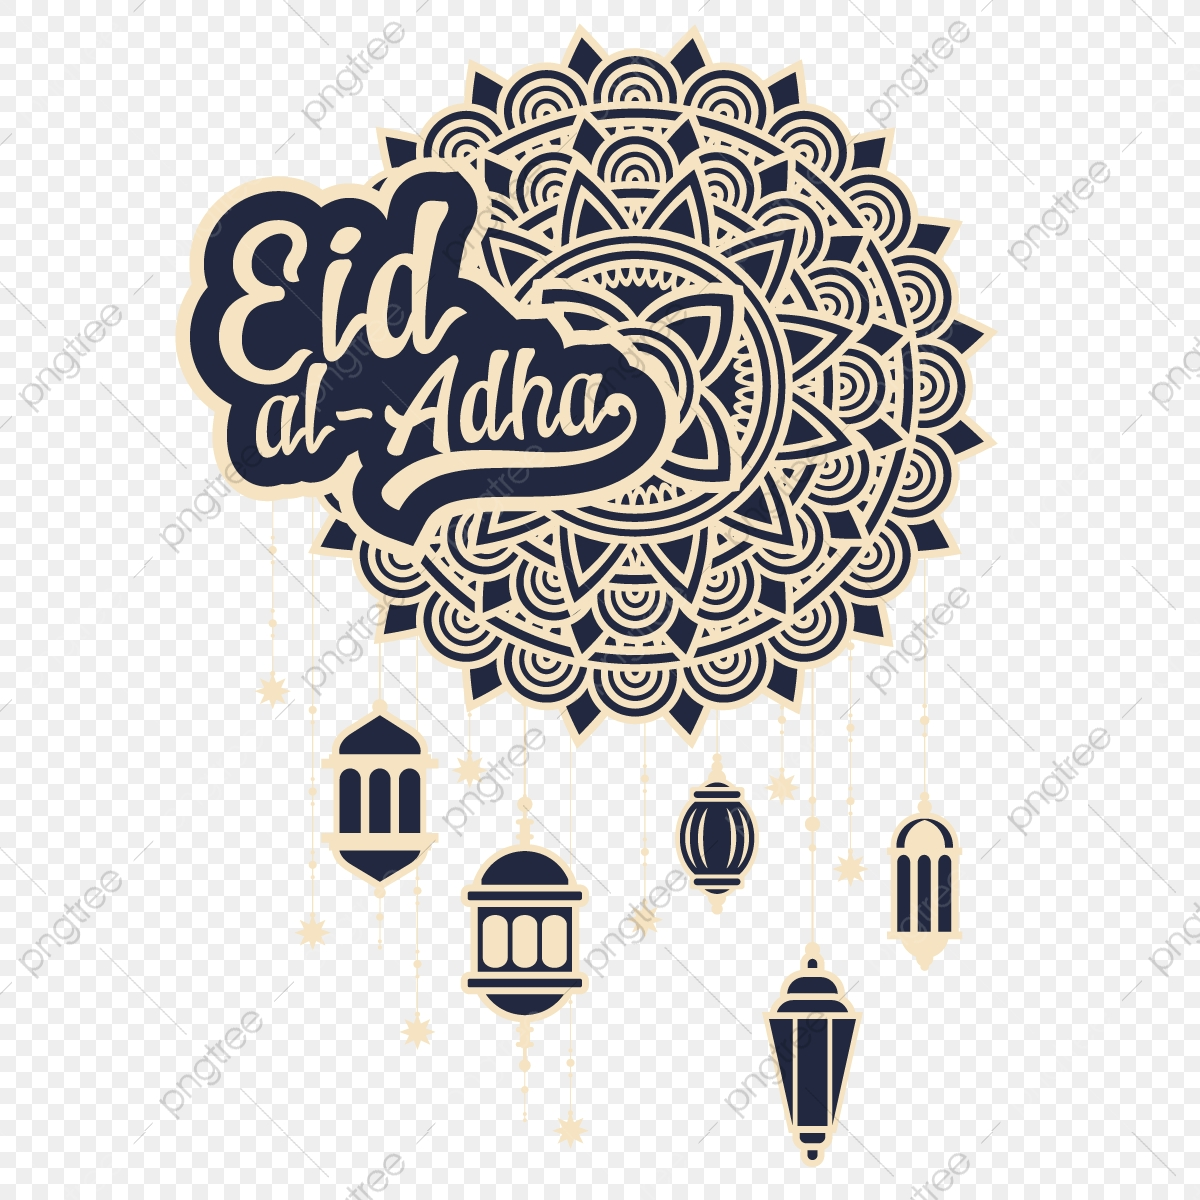 Eid Al Adha Mubarak Greeting Design Abstract Mandala With